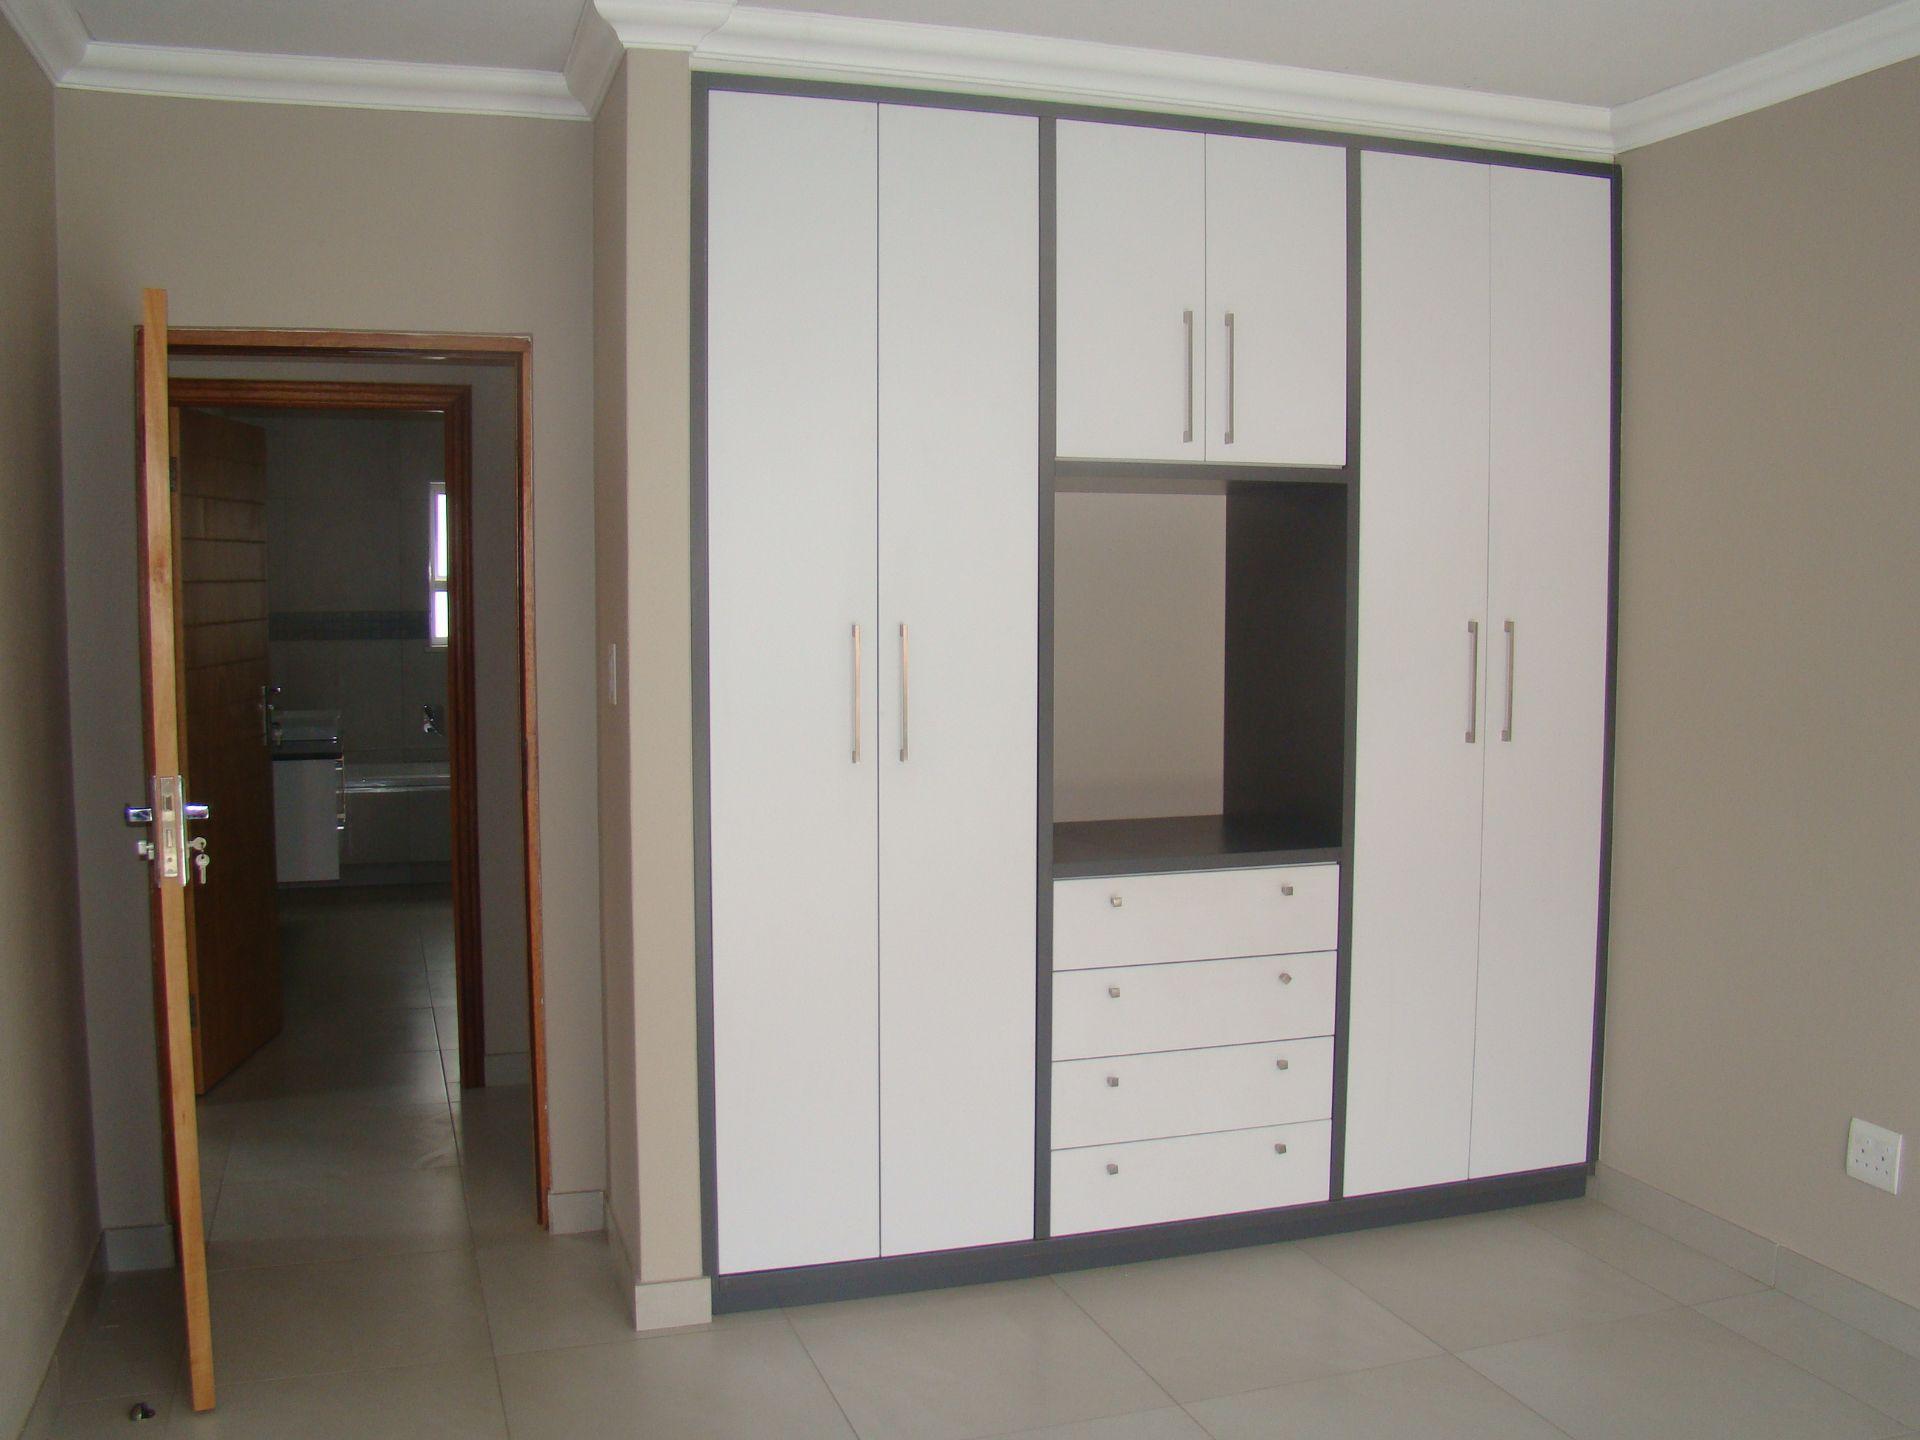 Craigavon 3rd bedroom cupboards.JPG